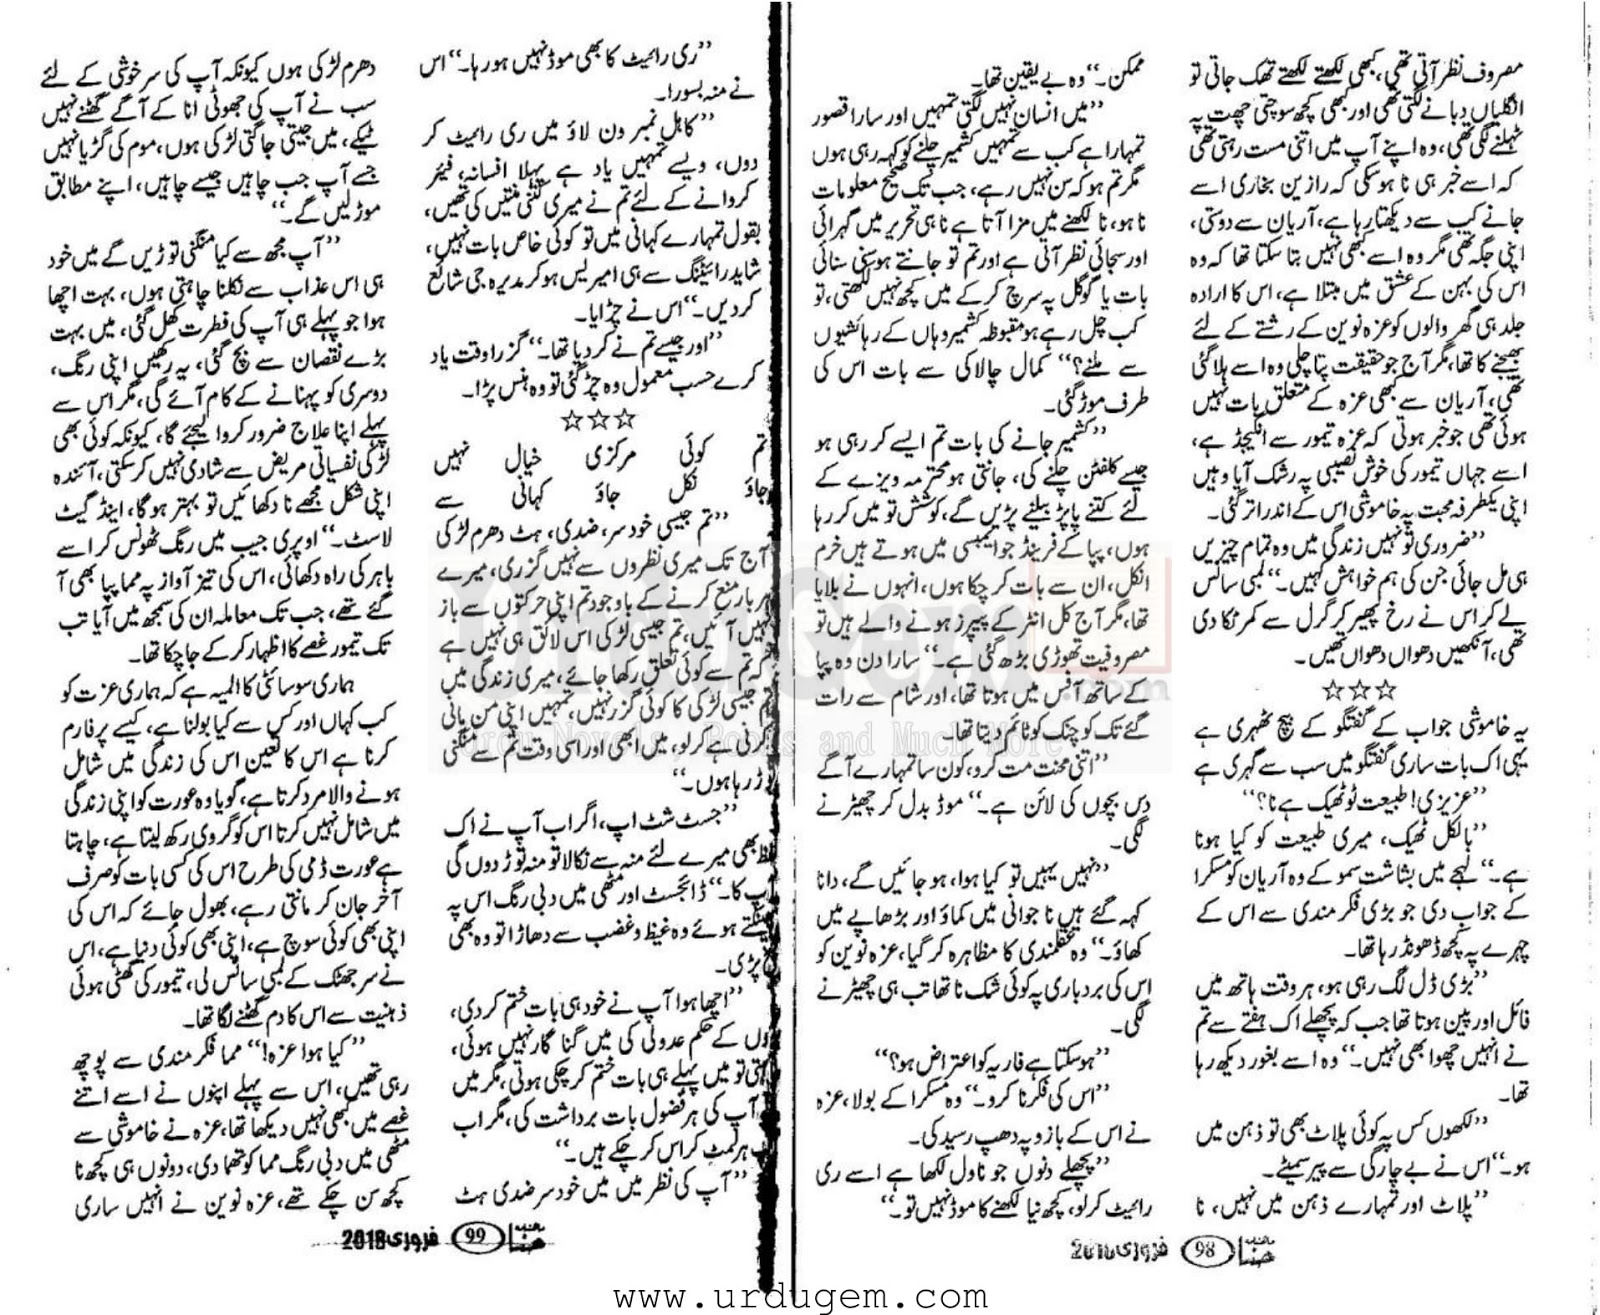 Kitab Dost: Man meet by Rehana Aftab Online Reading